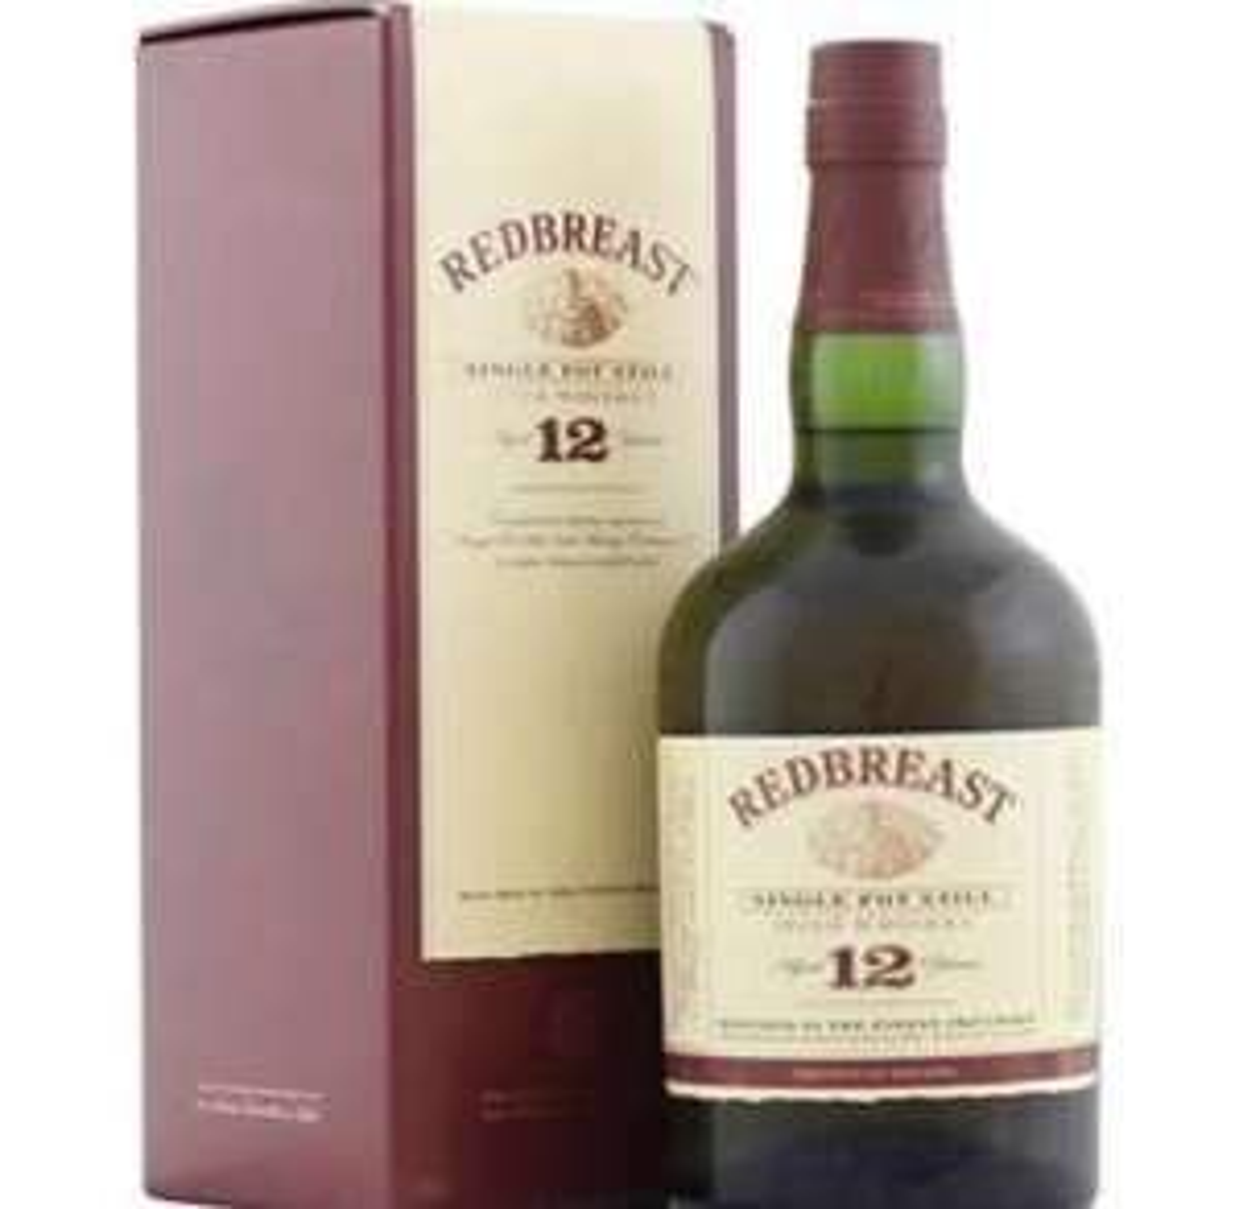 Redbreast 12 year old Irish whiskey £34.90 Amazon (whisky)